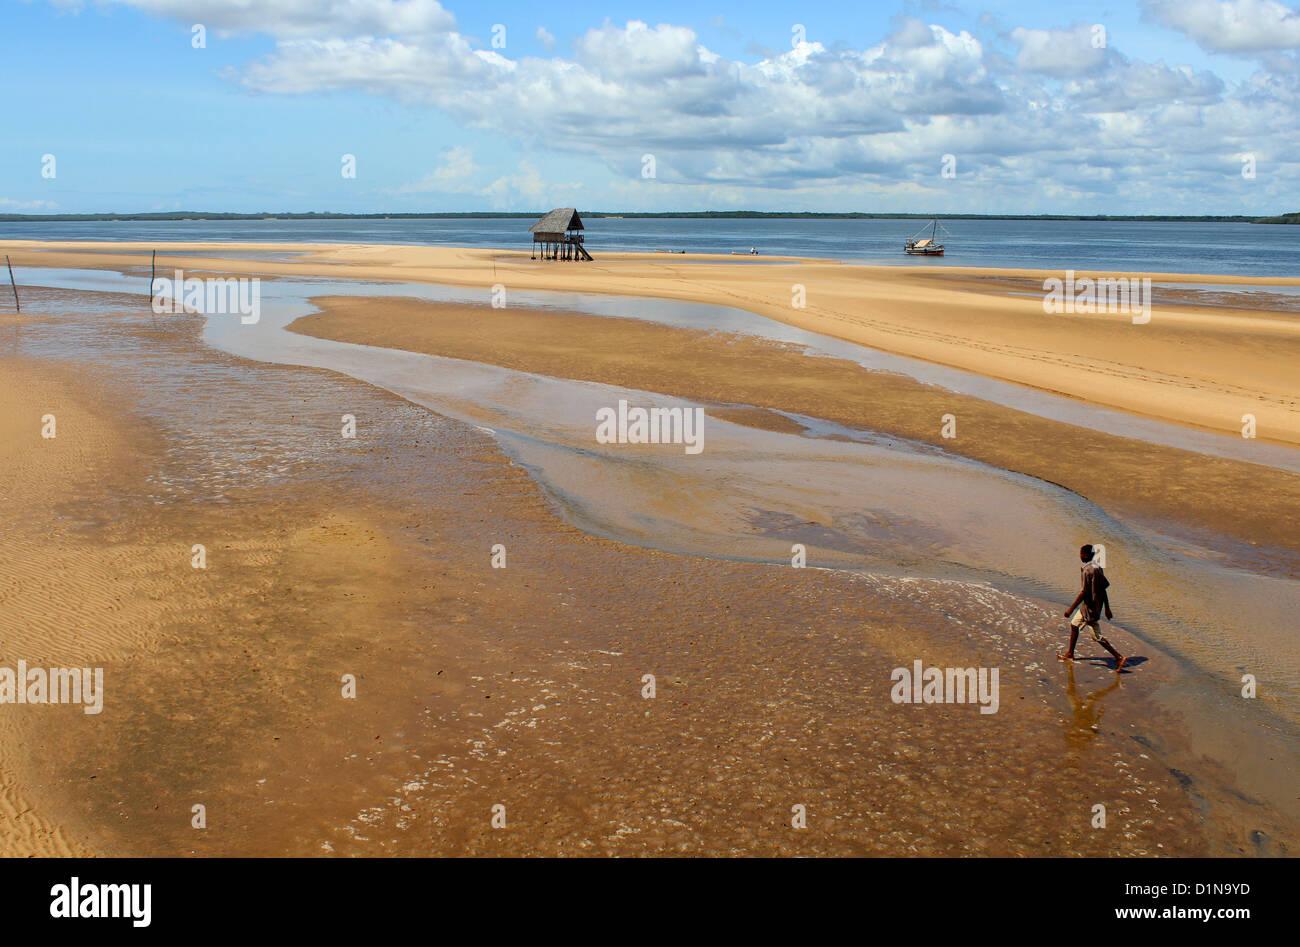 Playa y frente a la orilla Kipungani Explorer beach resort, Isla de Lamu, Kenya, Africa Oriental Imagen De Stock